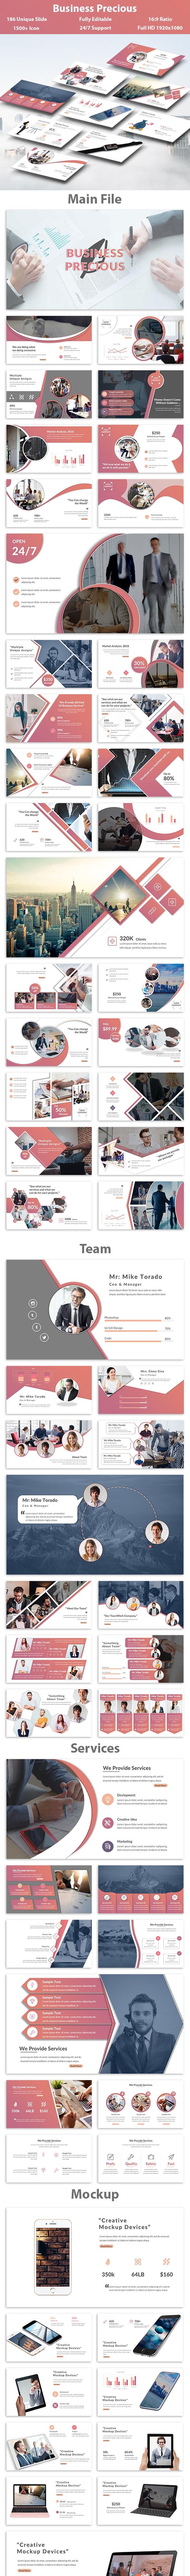 Business Precious Google Slide Template - Google Slides Presentation Templates